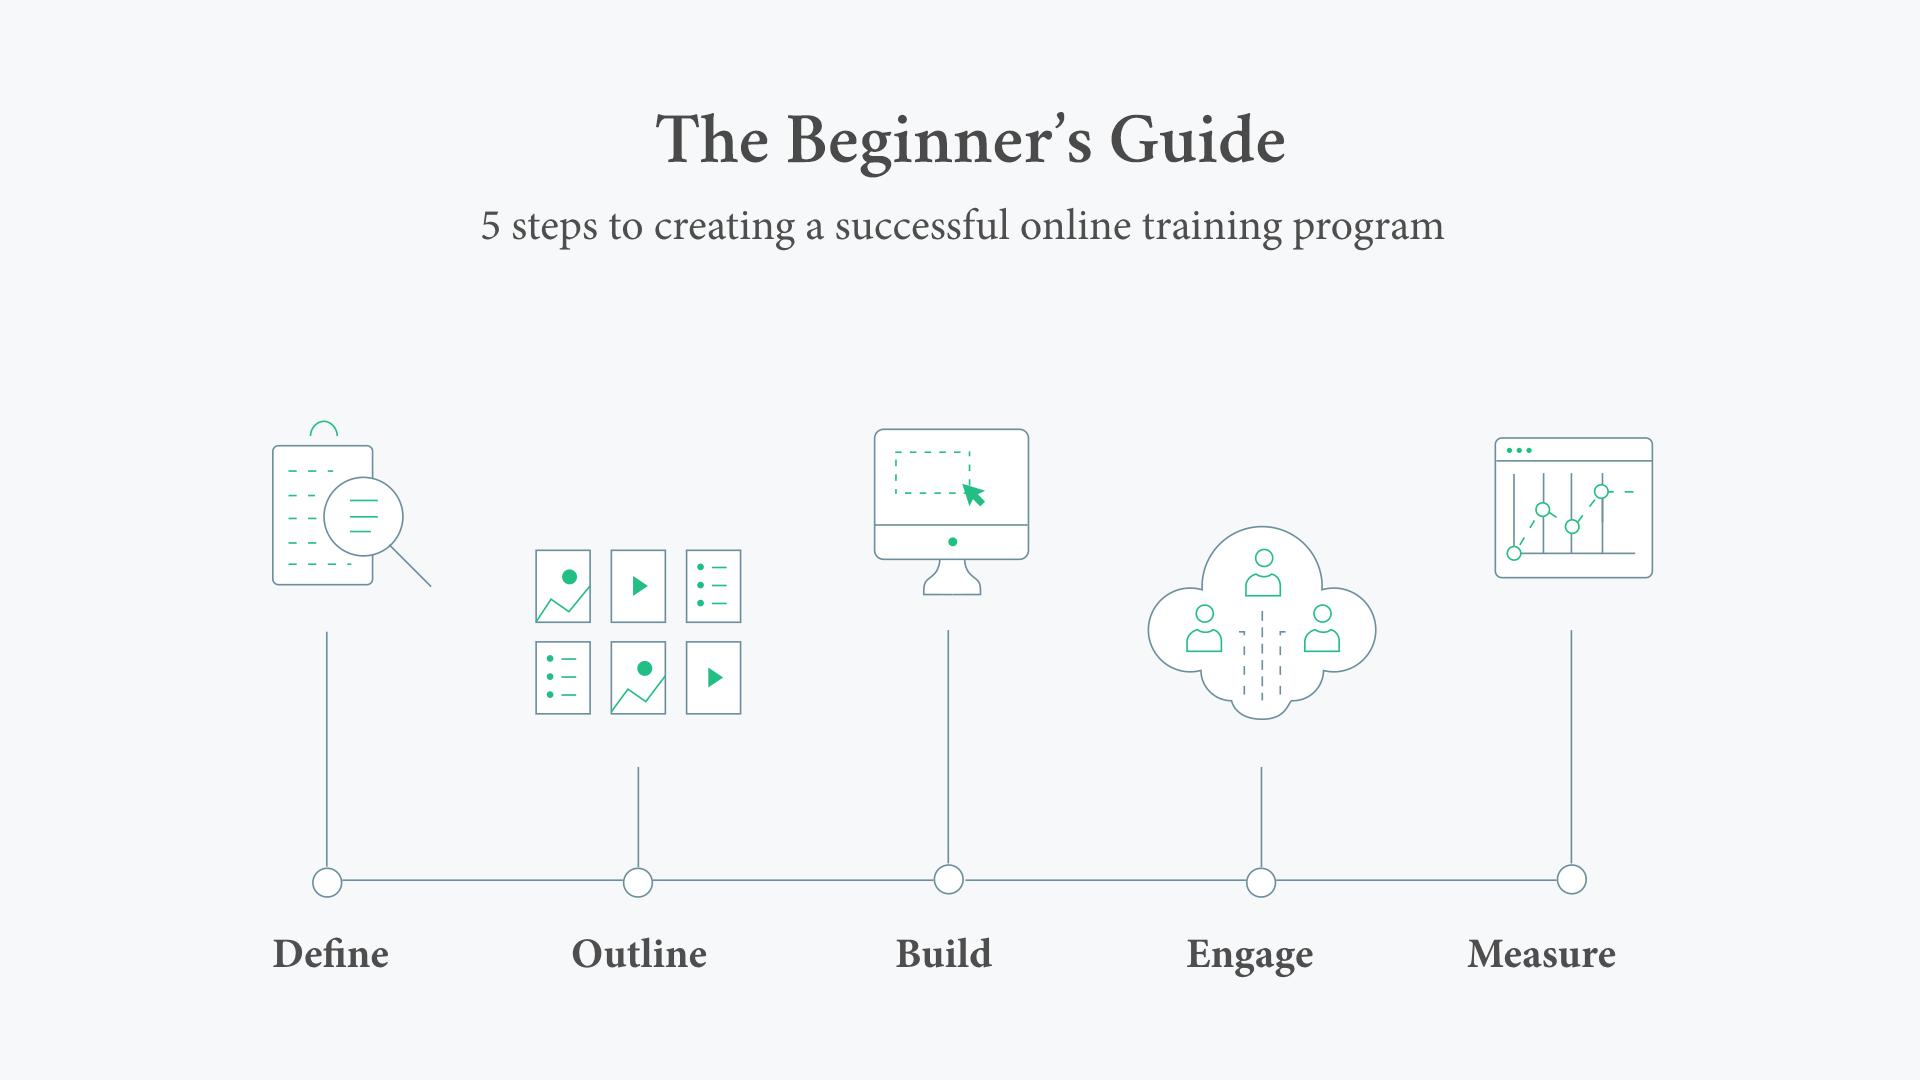 20171005175716_build-course-framework.png